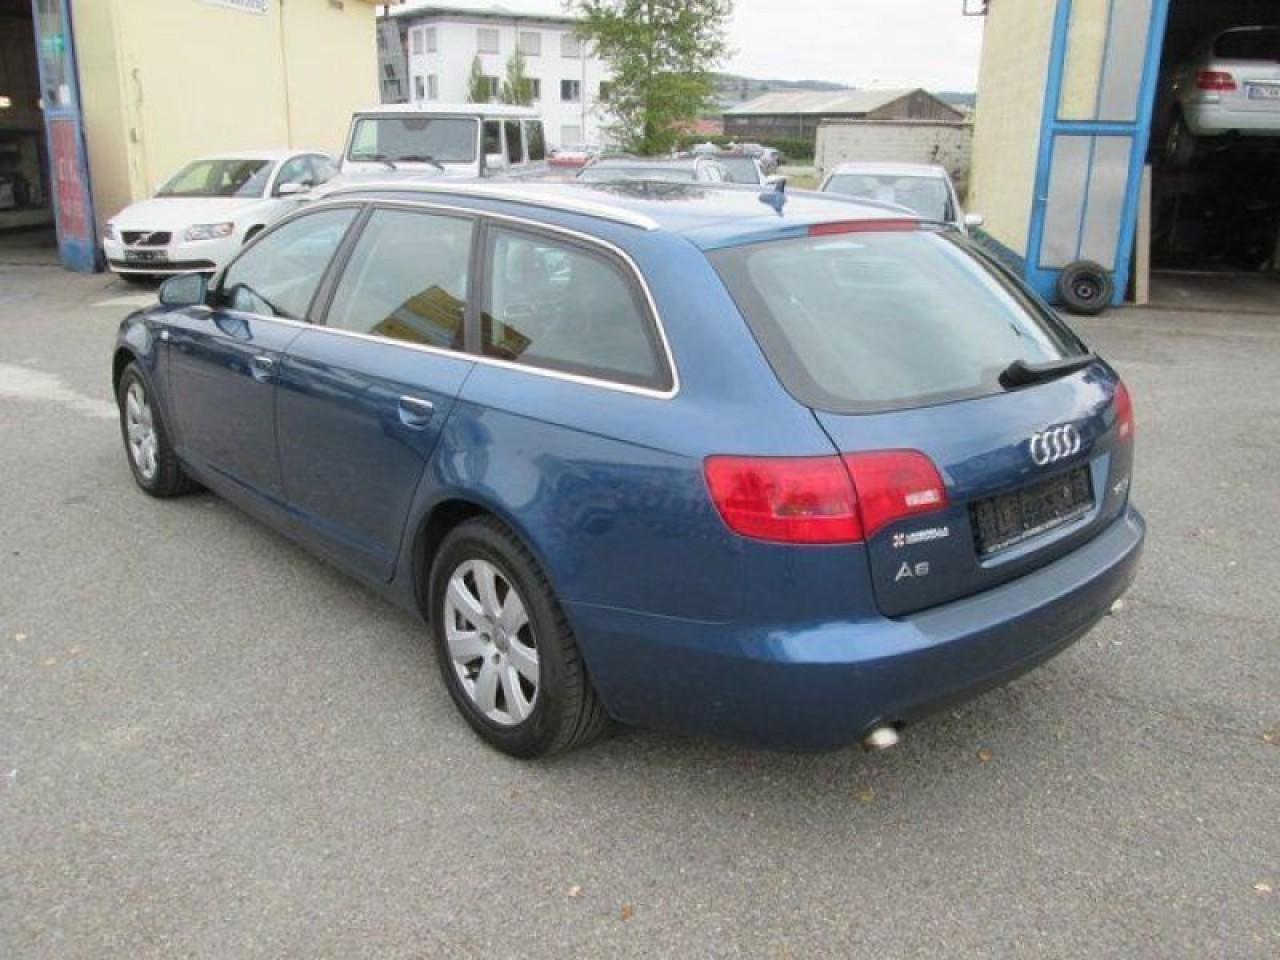 Dezmembrez Audi A6 4F C6  2006 asb bmk bpp 2.7 3.0 tdi